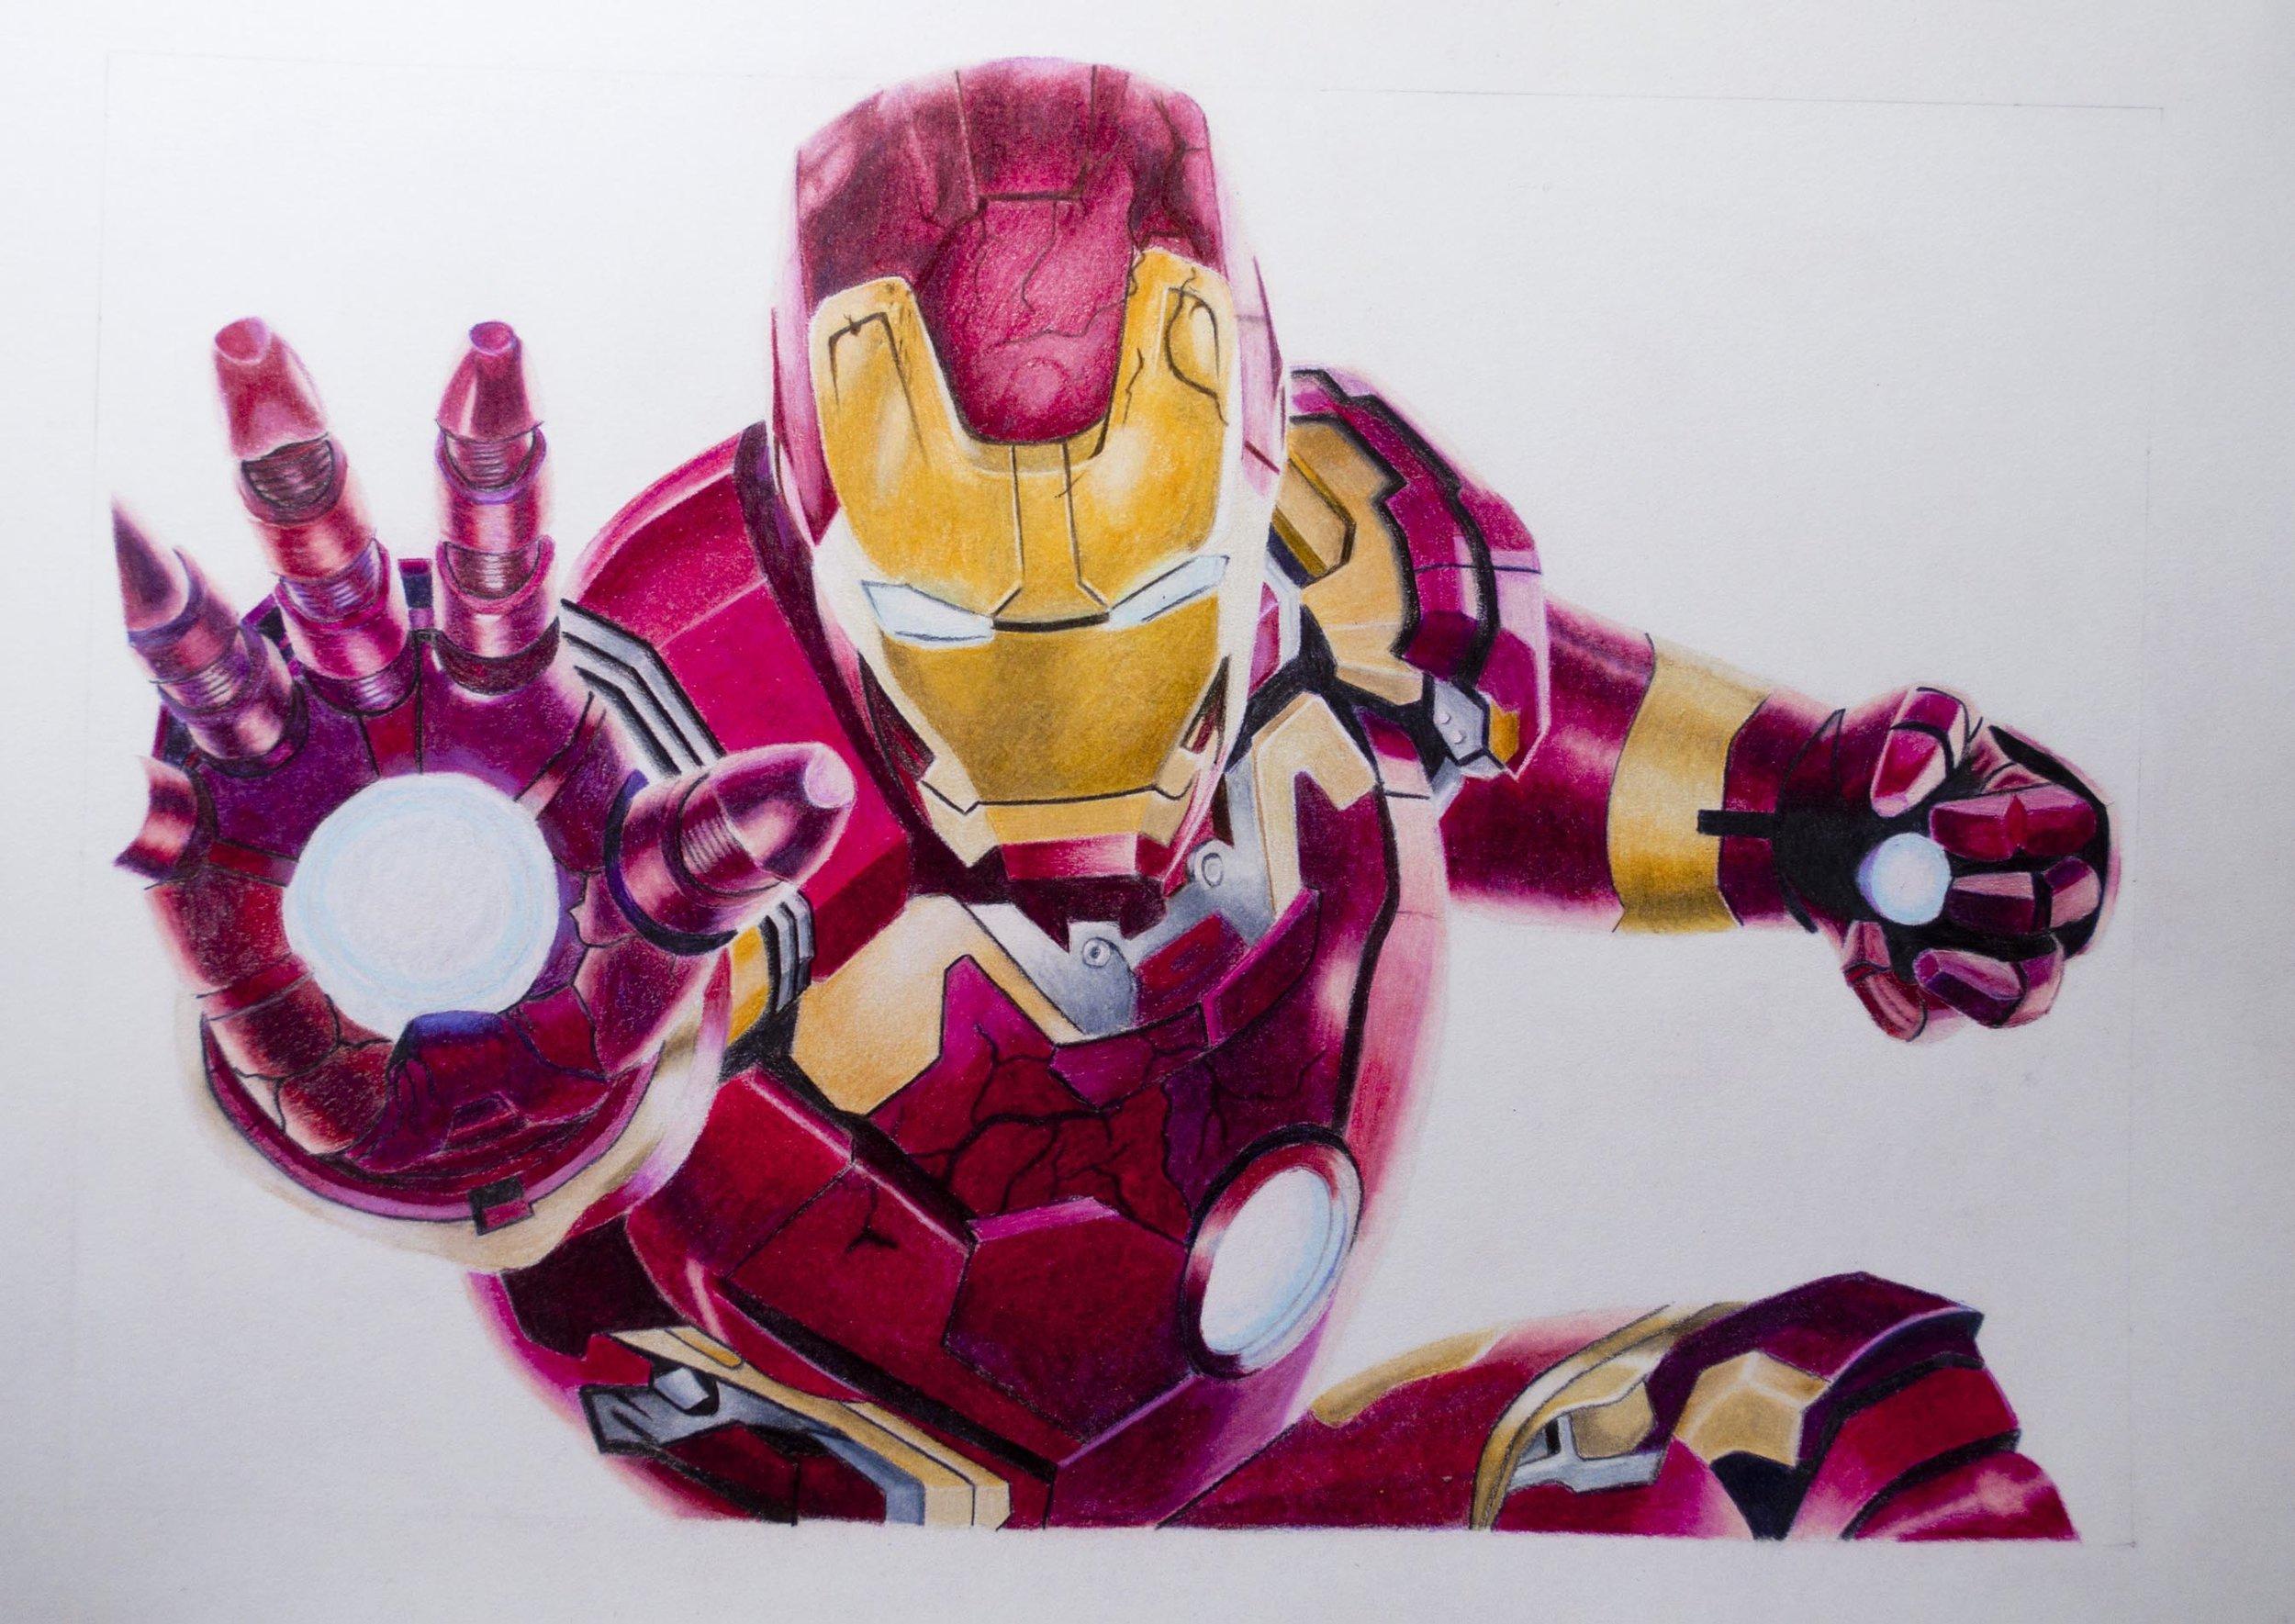 Iron Man Final Image White Background.jpg